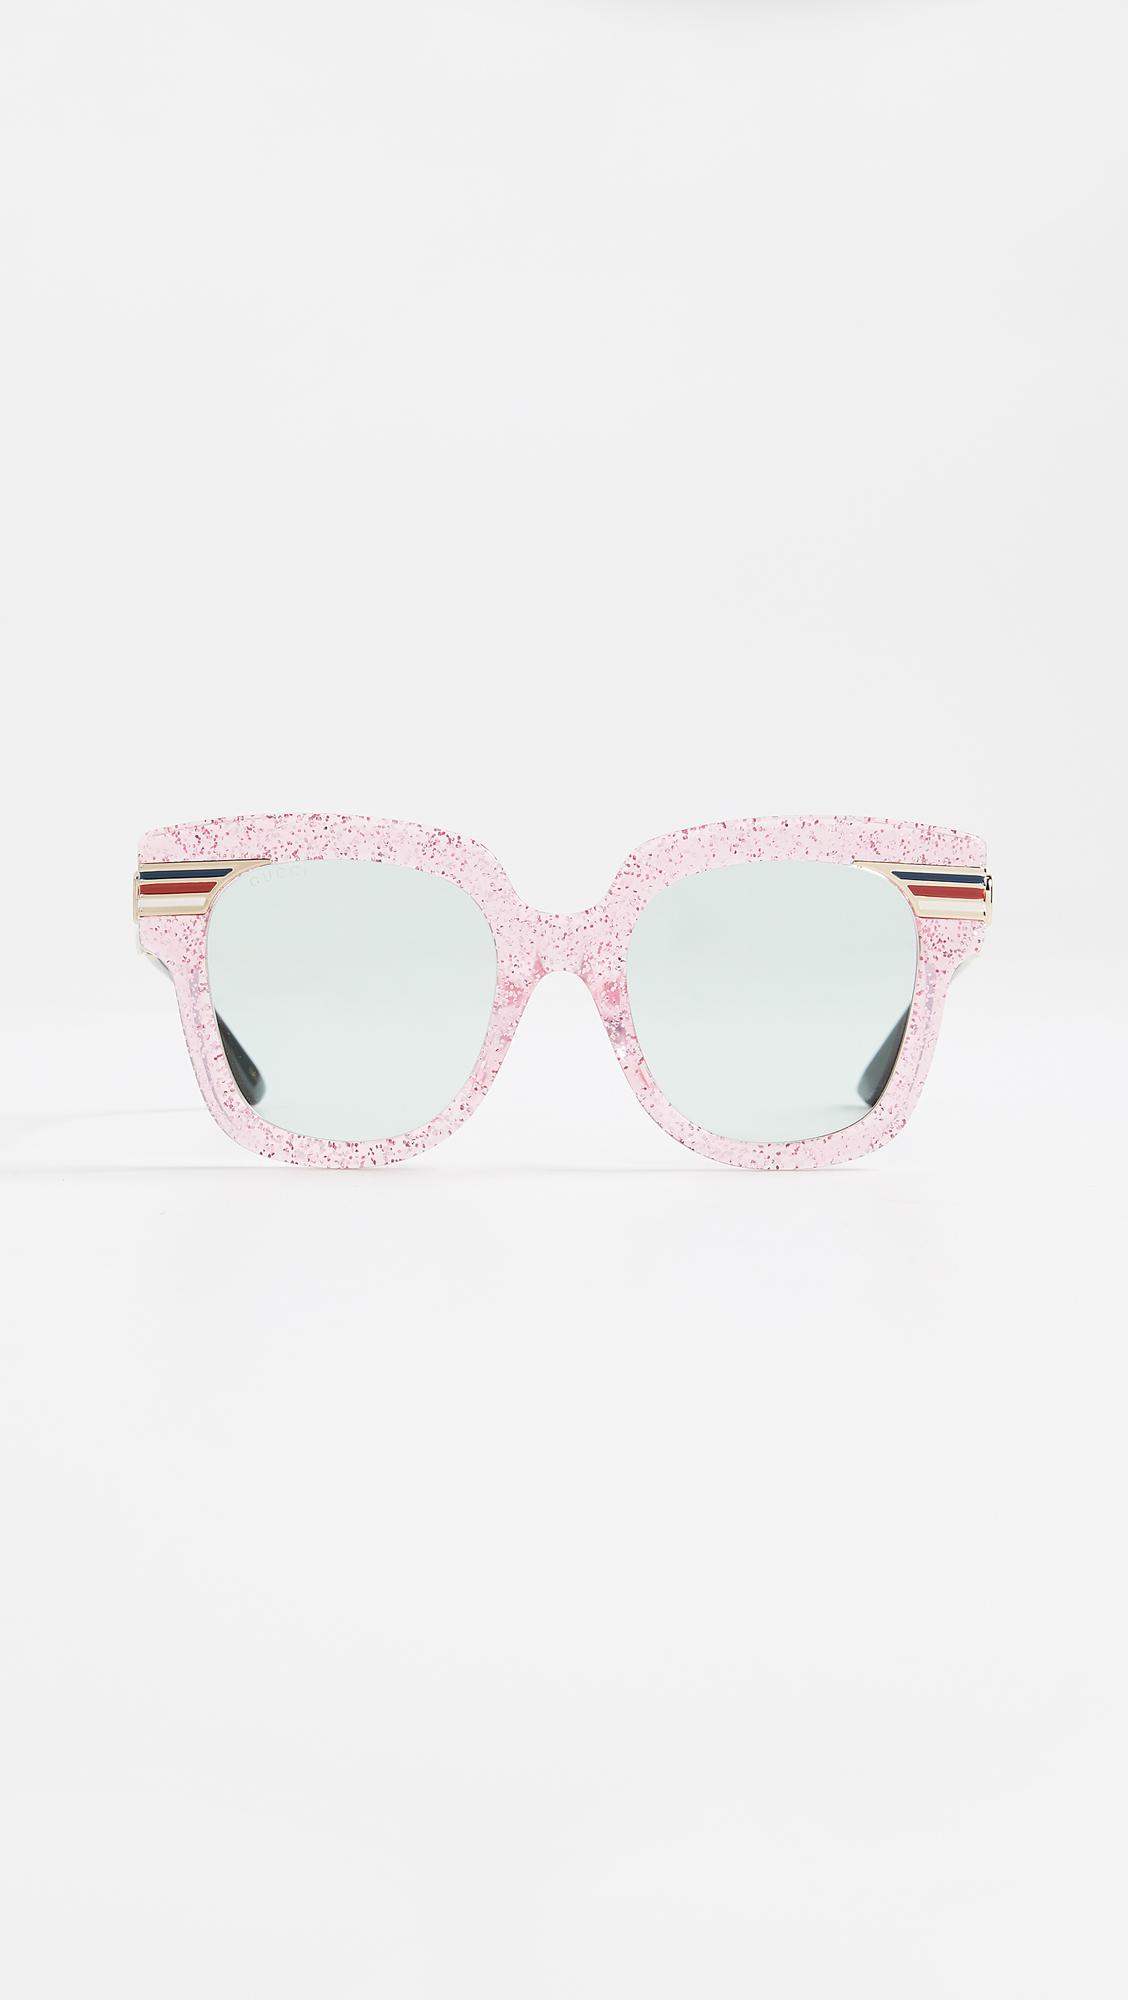 cd739cd75a7 Gucci. Women s Vintage Web Oversized Sunglasses